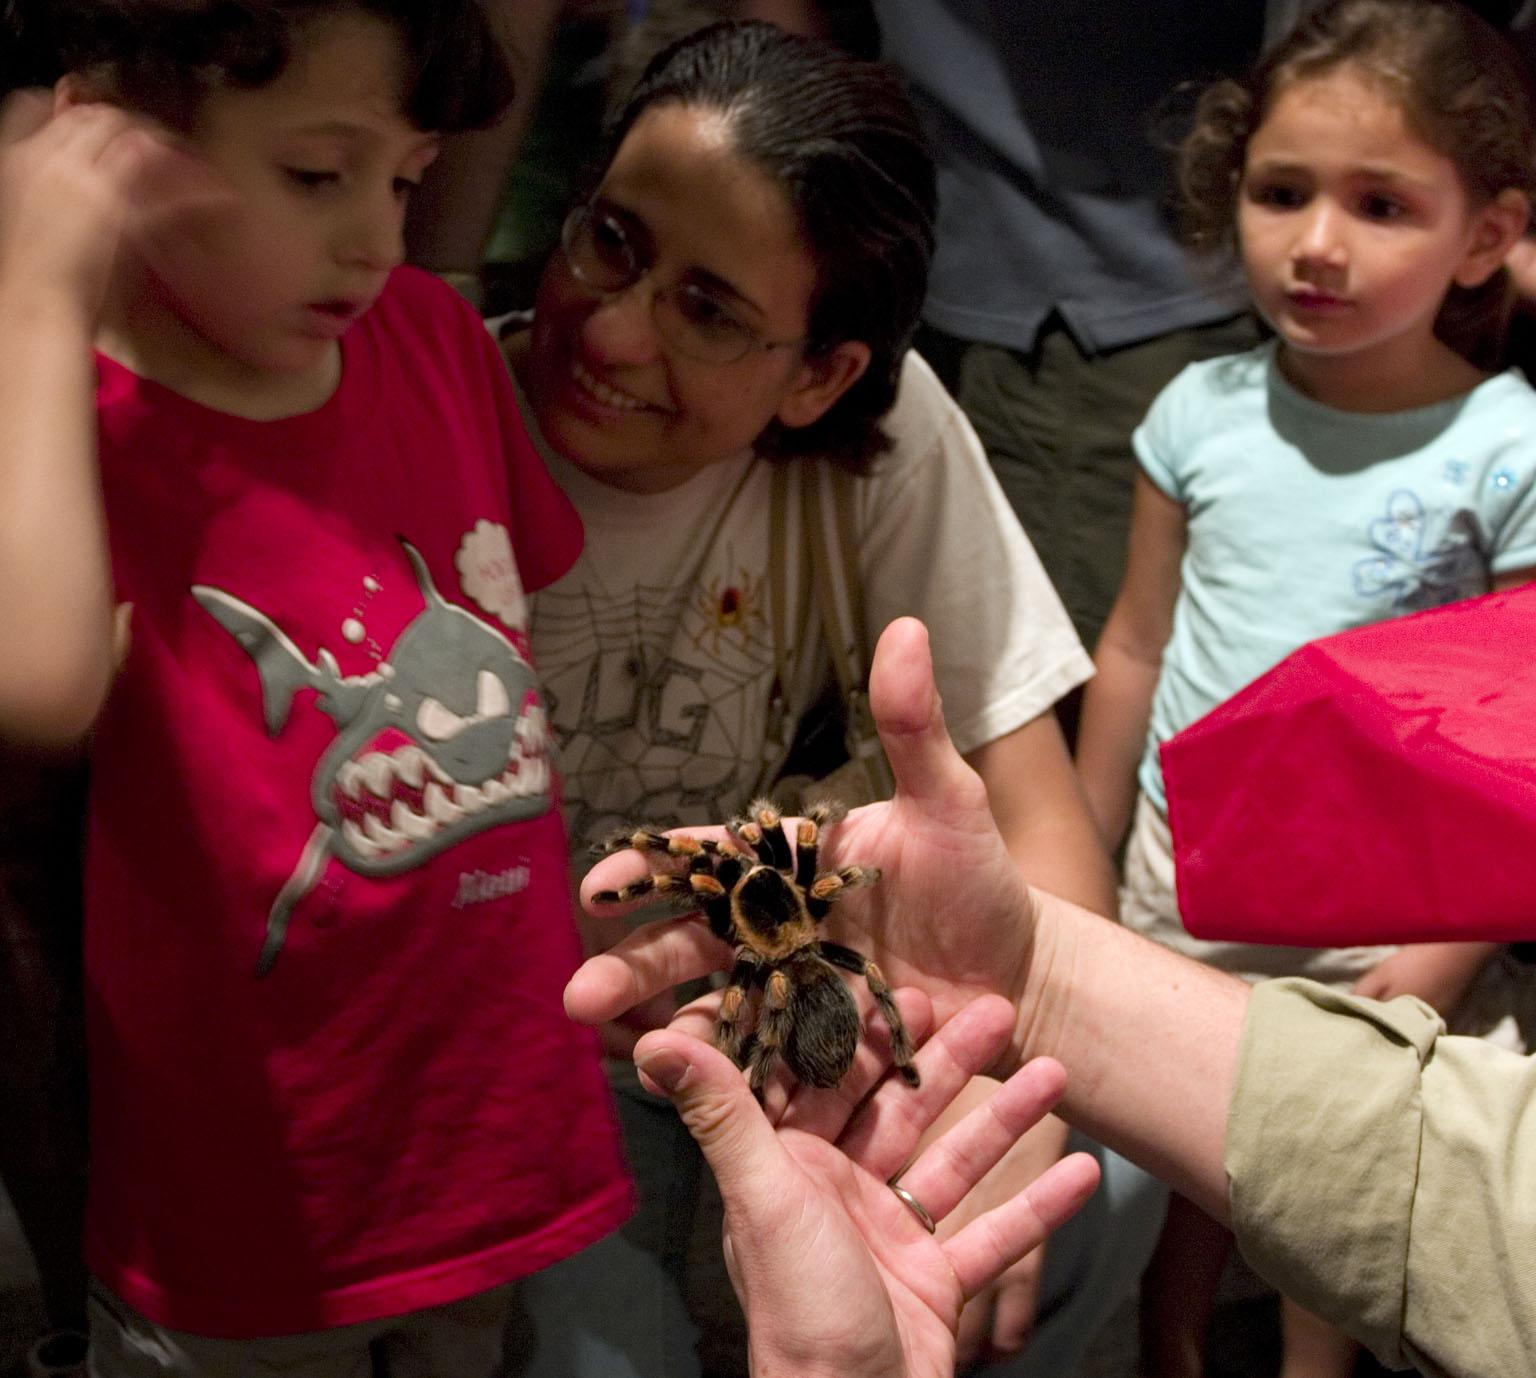 A boy appears cautious while someone is holding a tarantula near him.